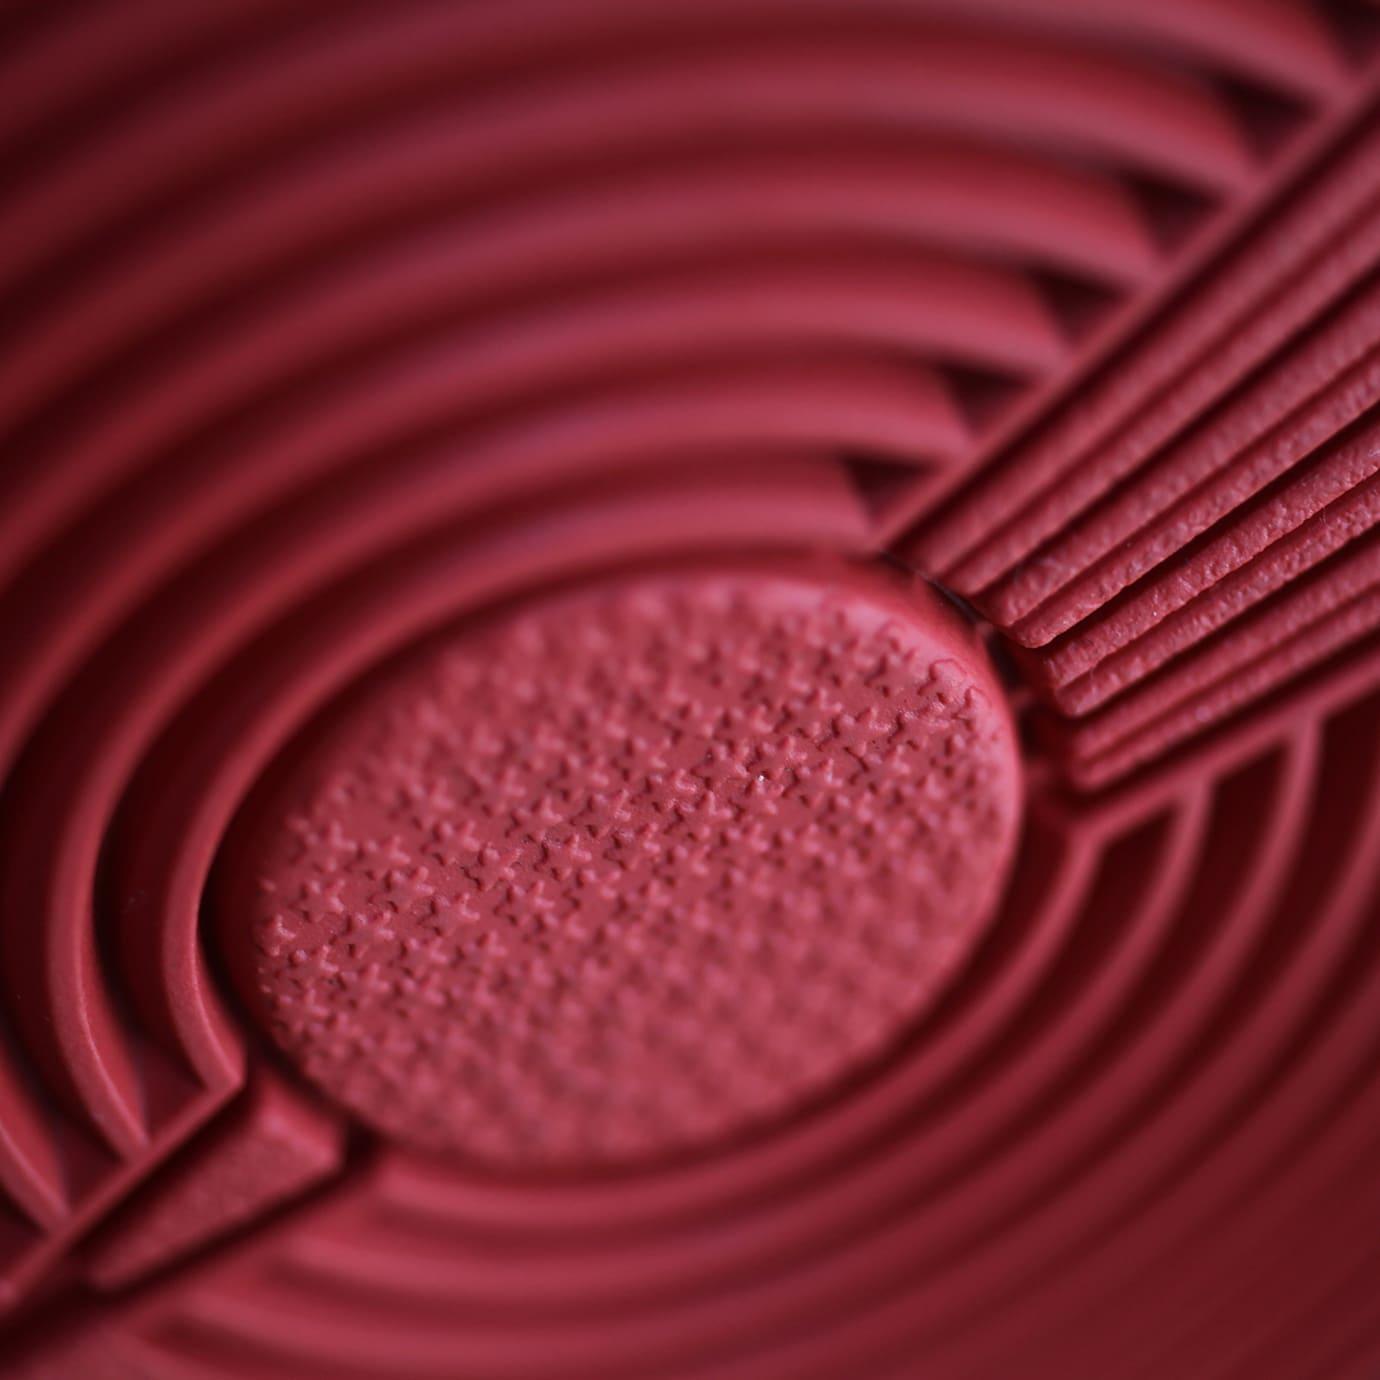 Nike SB Dunk Low Black Pigeon Release Date 88323-008 (15)